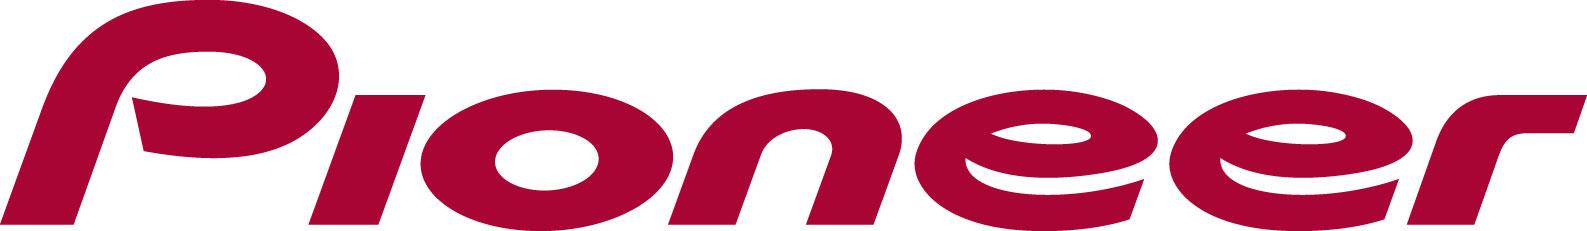 vector of the world pioneer logo